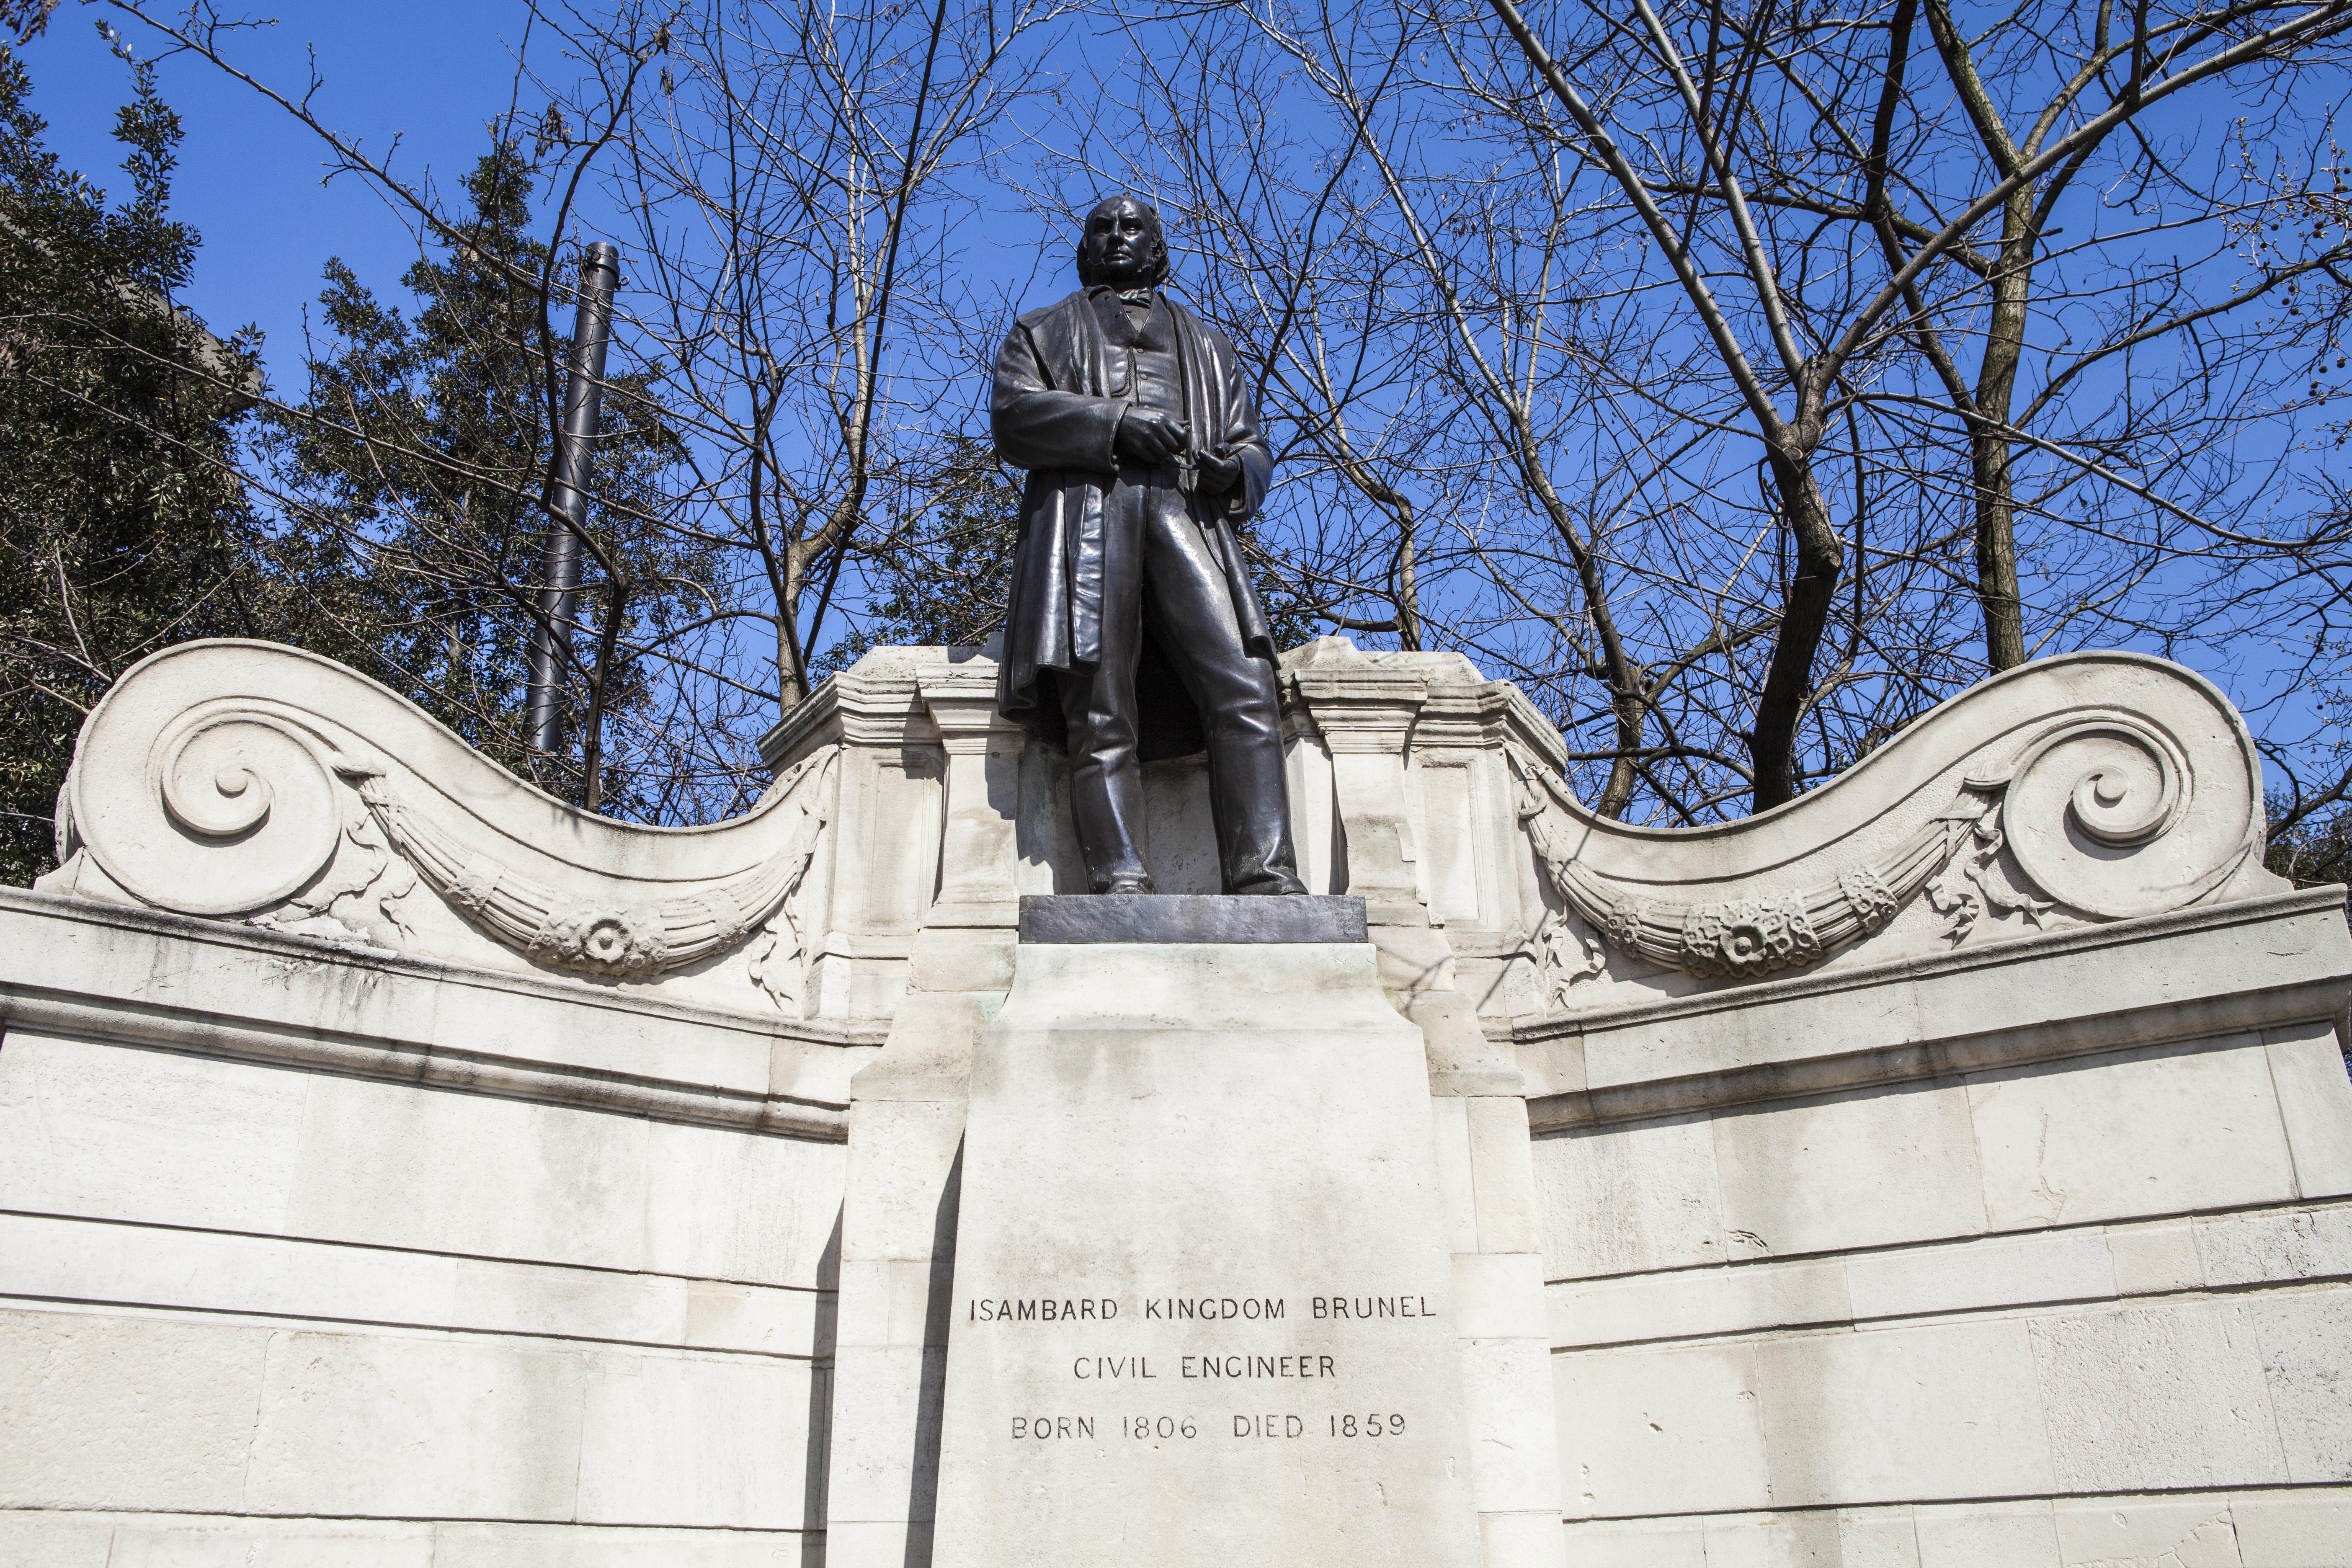 Isambard Kingdom Brunel, Civil Engineer